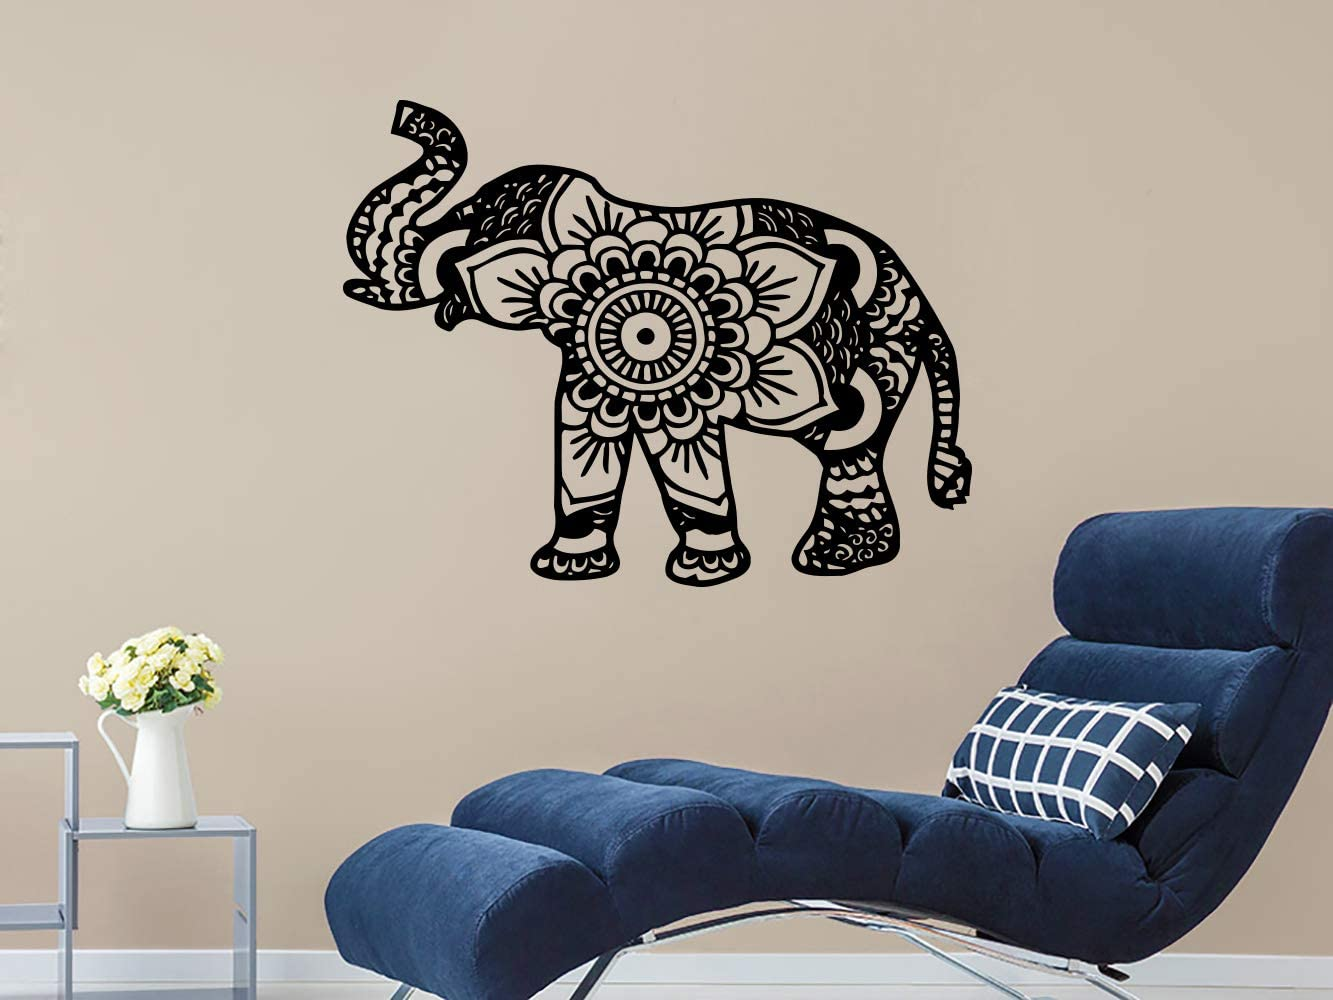 Wall Decal Elephant Vinyl Sticker Decals Lotus Indian Elephant Floral Patterns Mandala Tribal Buddha Ganesh Om Home Decor Bedroom Art Design Interior NS384